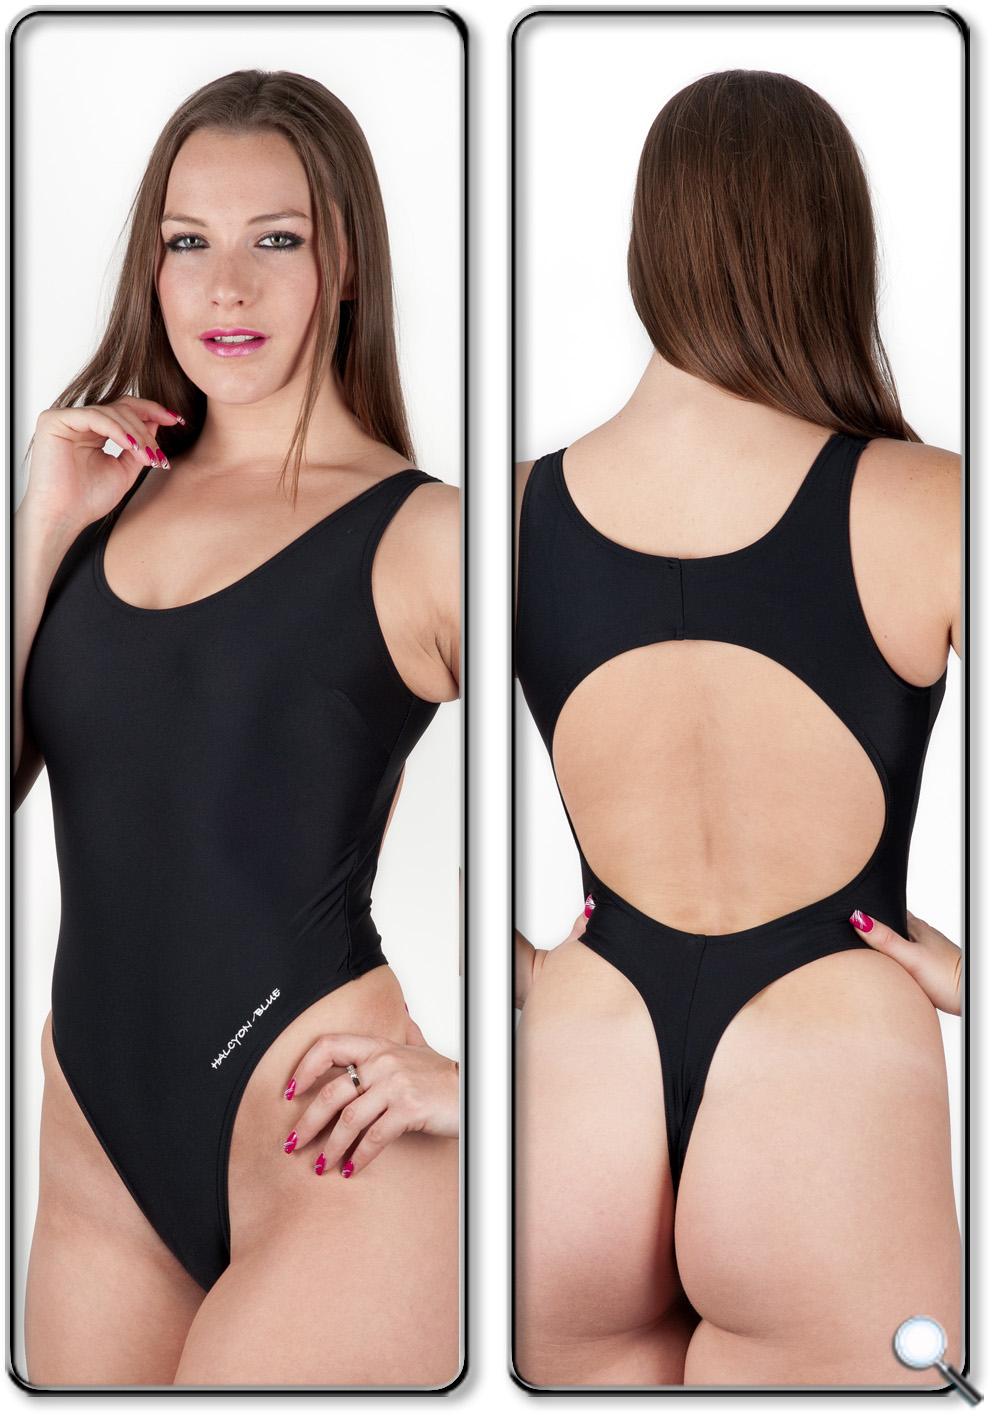 Dani sports thong swimsuit / leotard